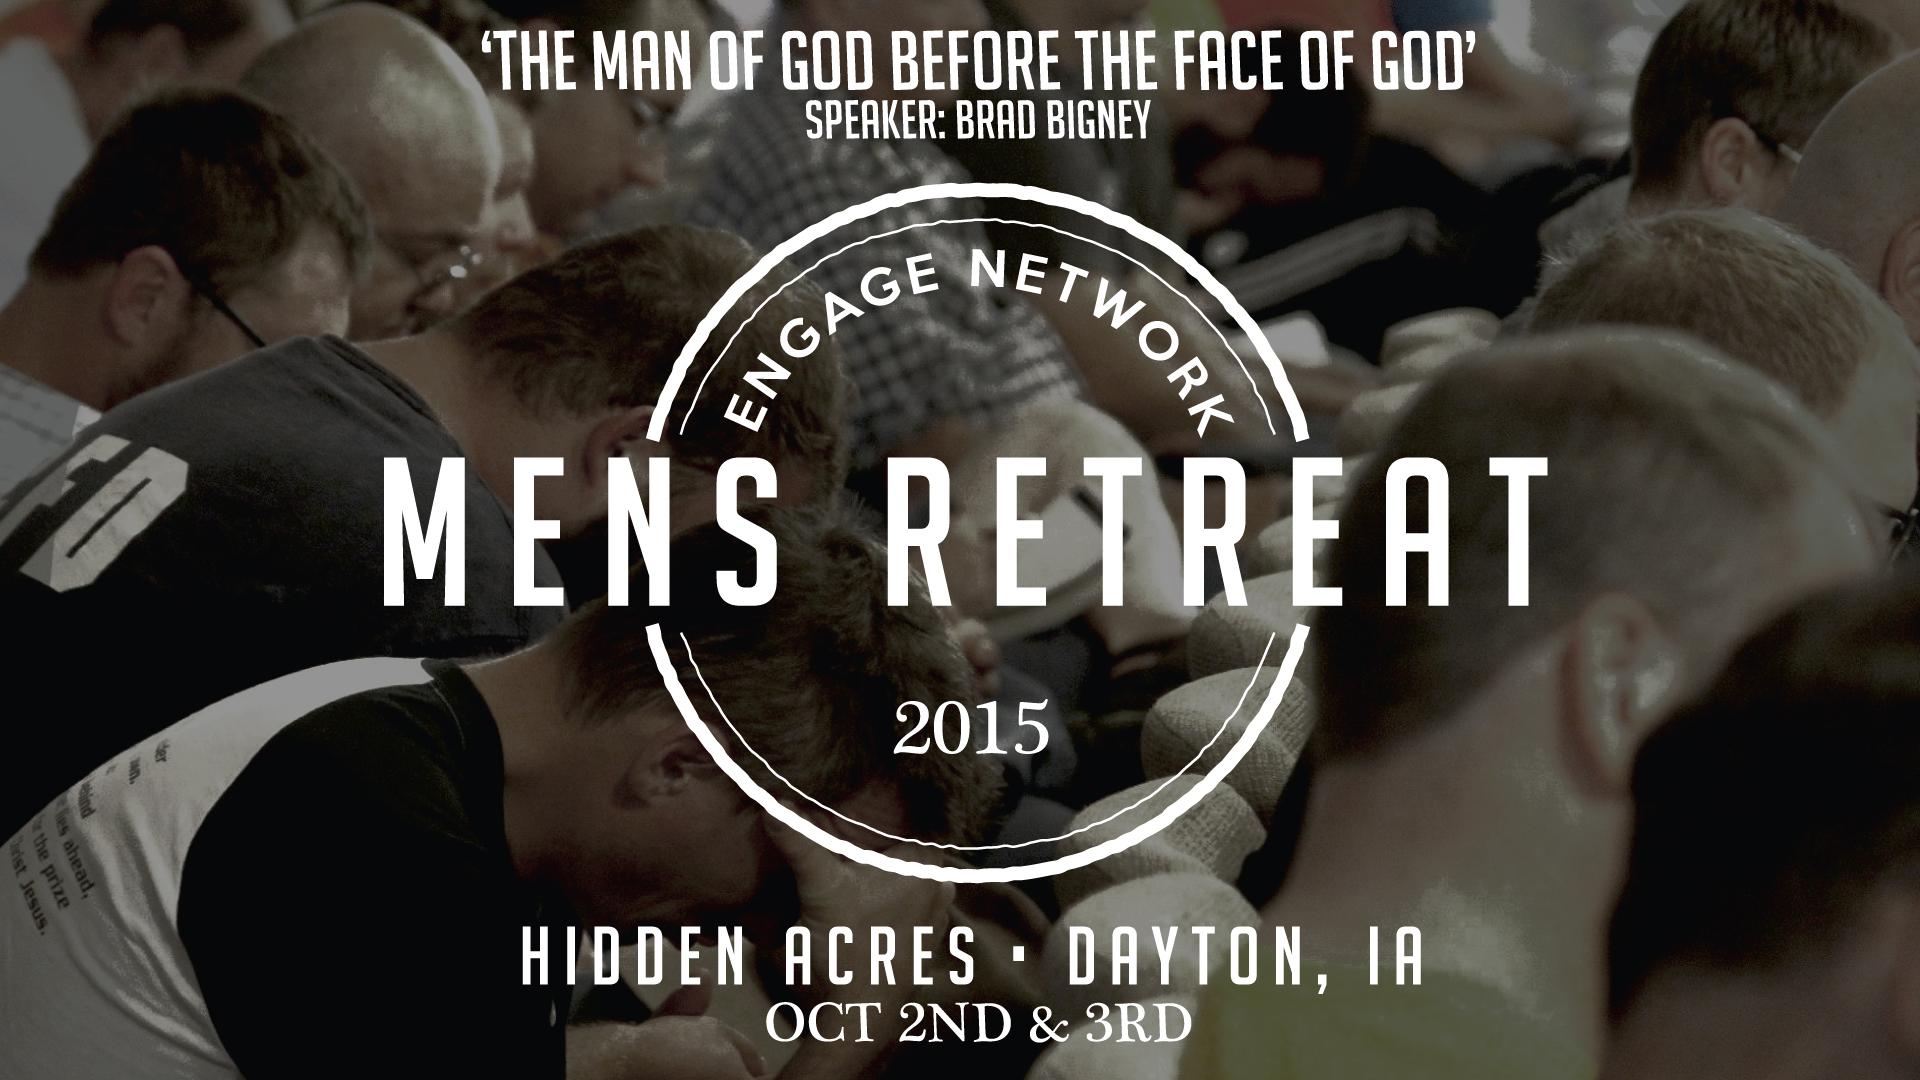 Men's Retreat 2015